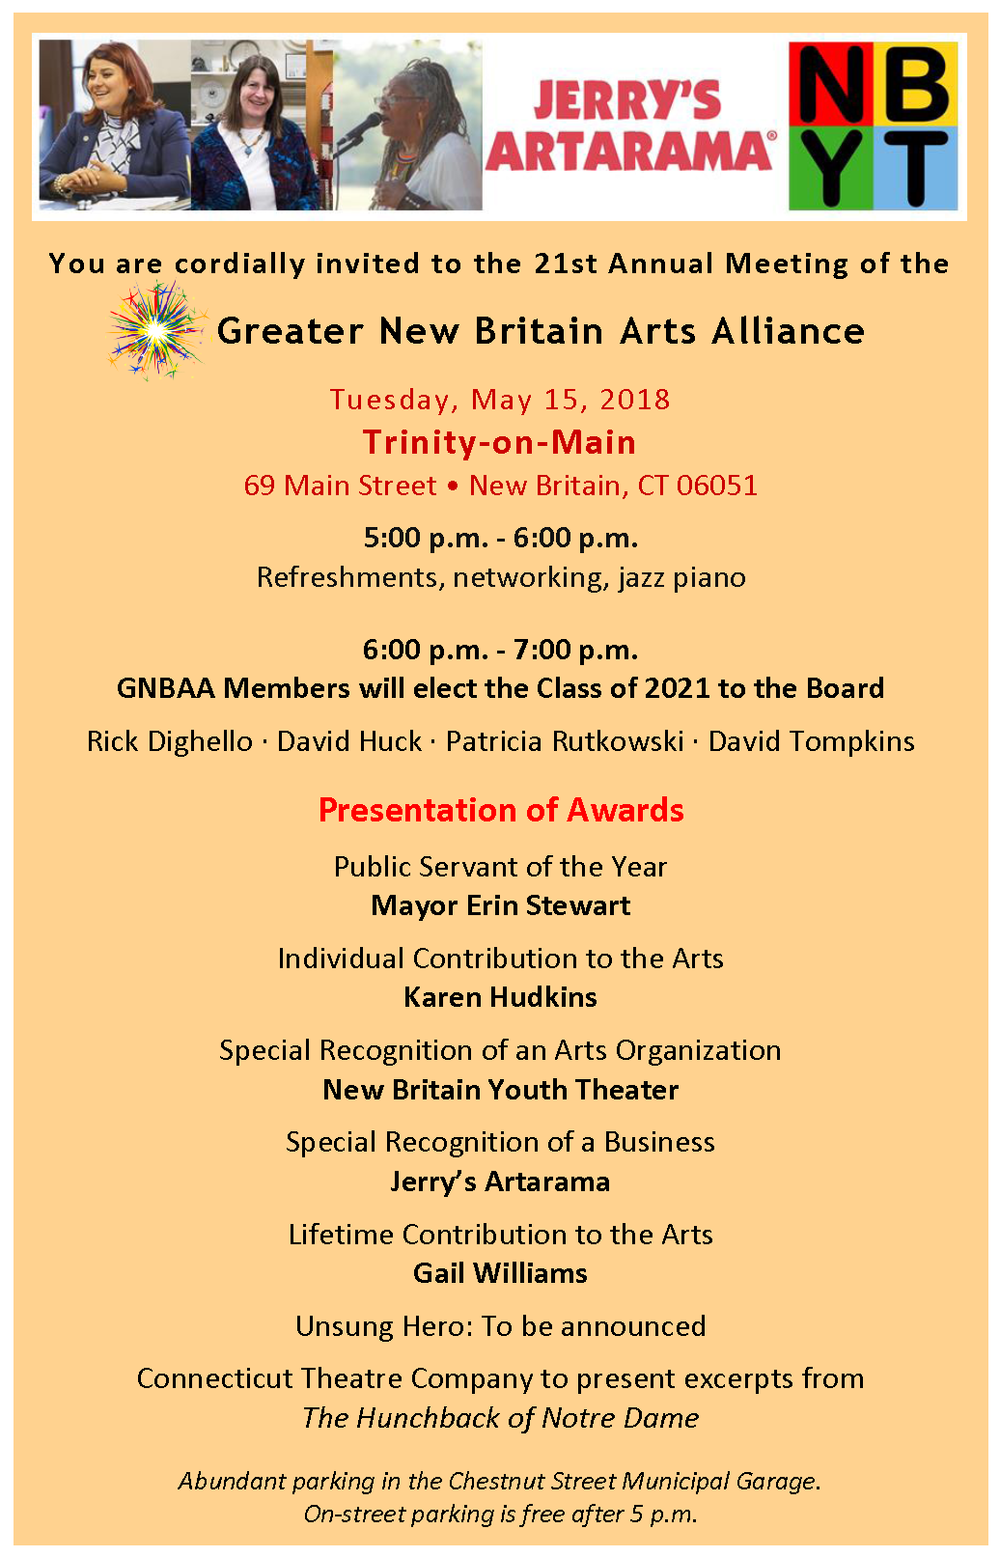 2018 GNBAA Annual Meeting Invitation.png